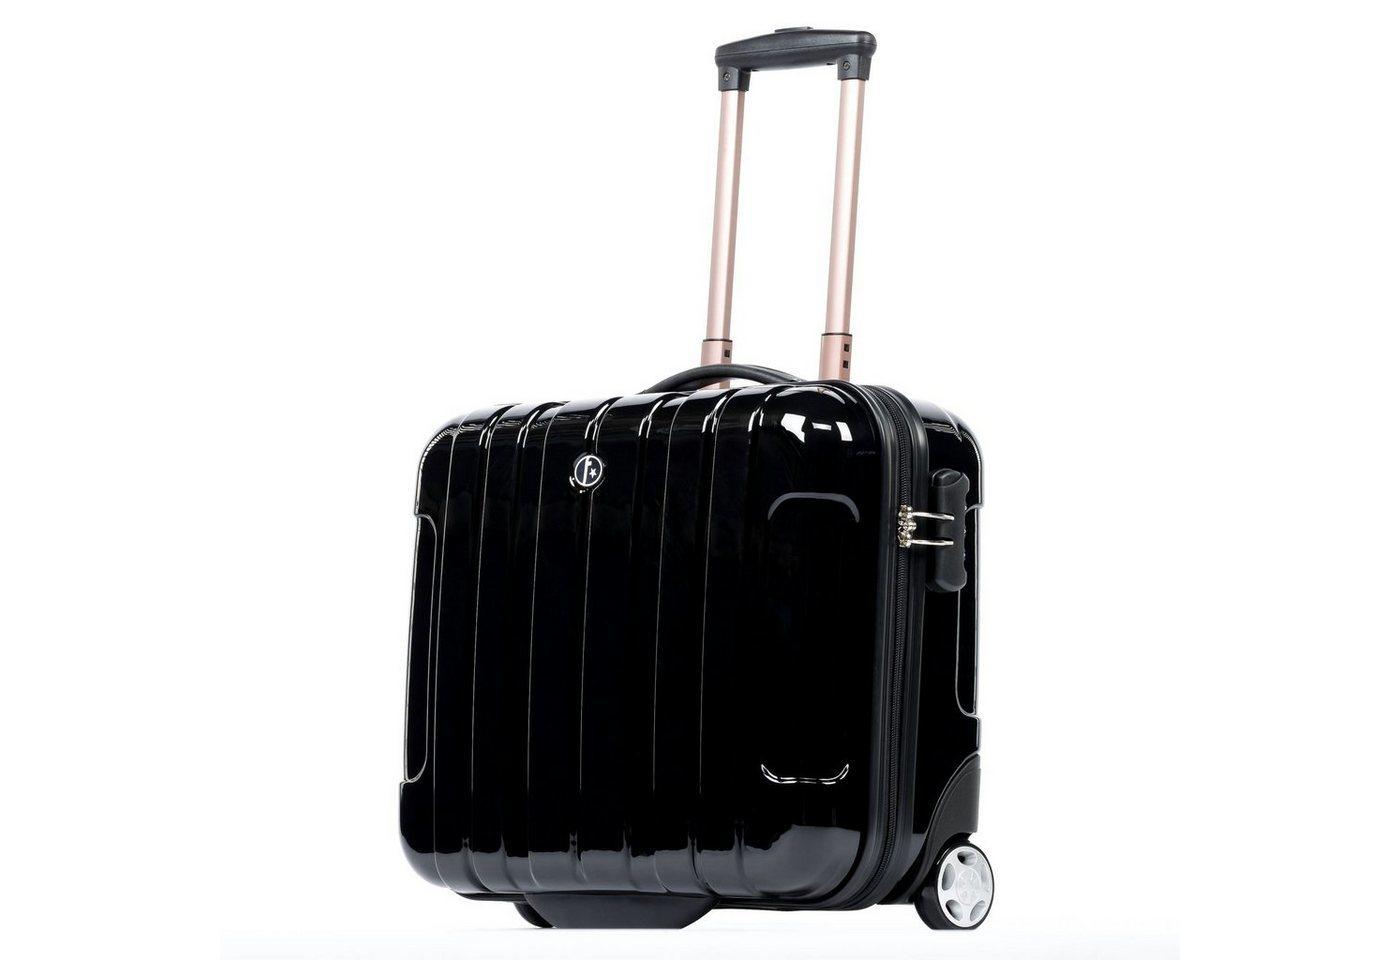 ferg handgep ck trolley paris 2 rollen koffer. Black Bedroom Furniture Sets. Home Design Ideas